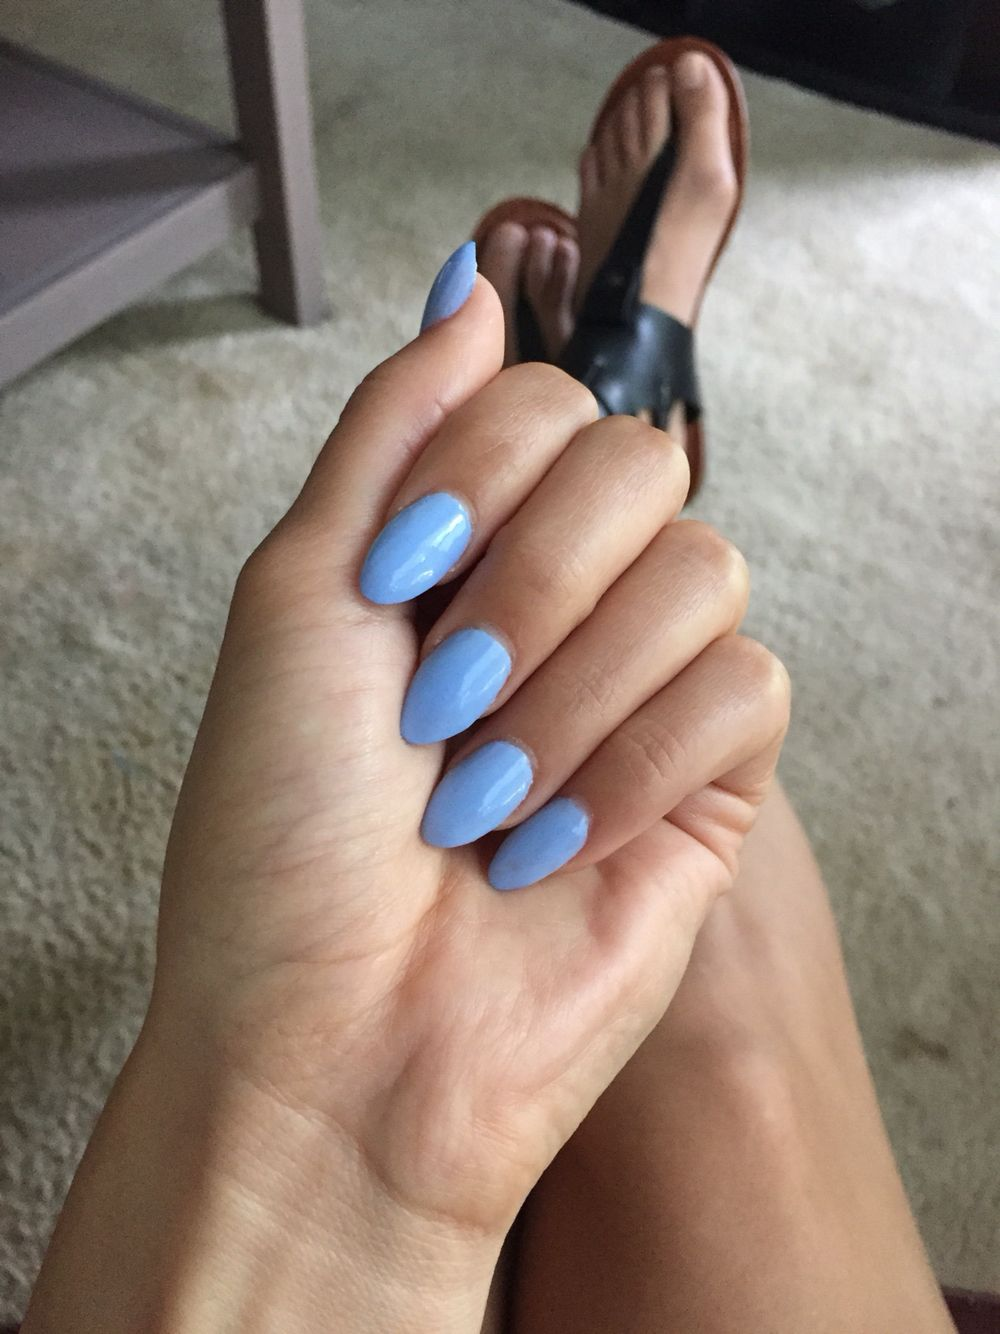 Acrylic Almond Nails Essie Bikinisoteeny Spring Almond Acrylic Nails Baby Blue Nails Baby Blue Acrylic Nails